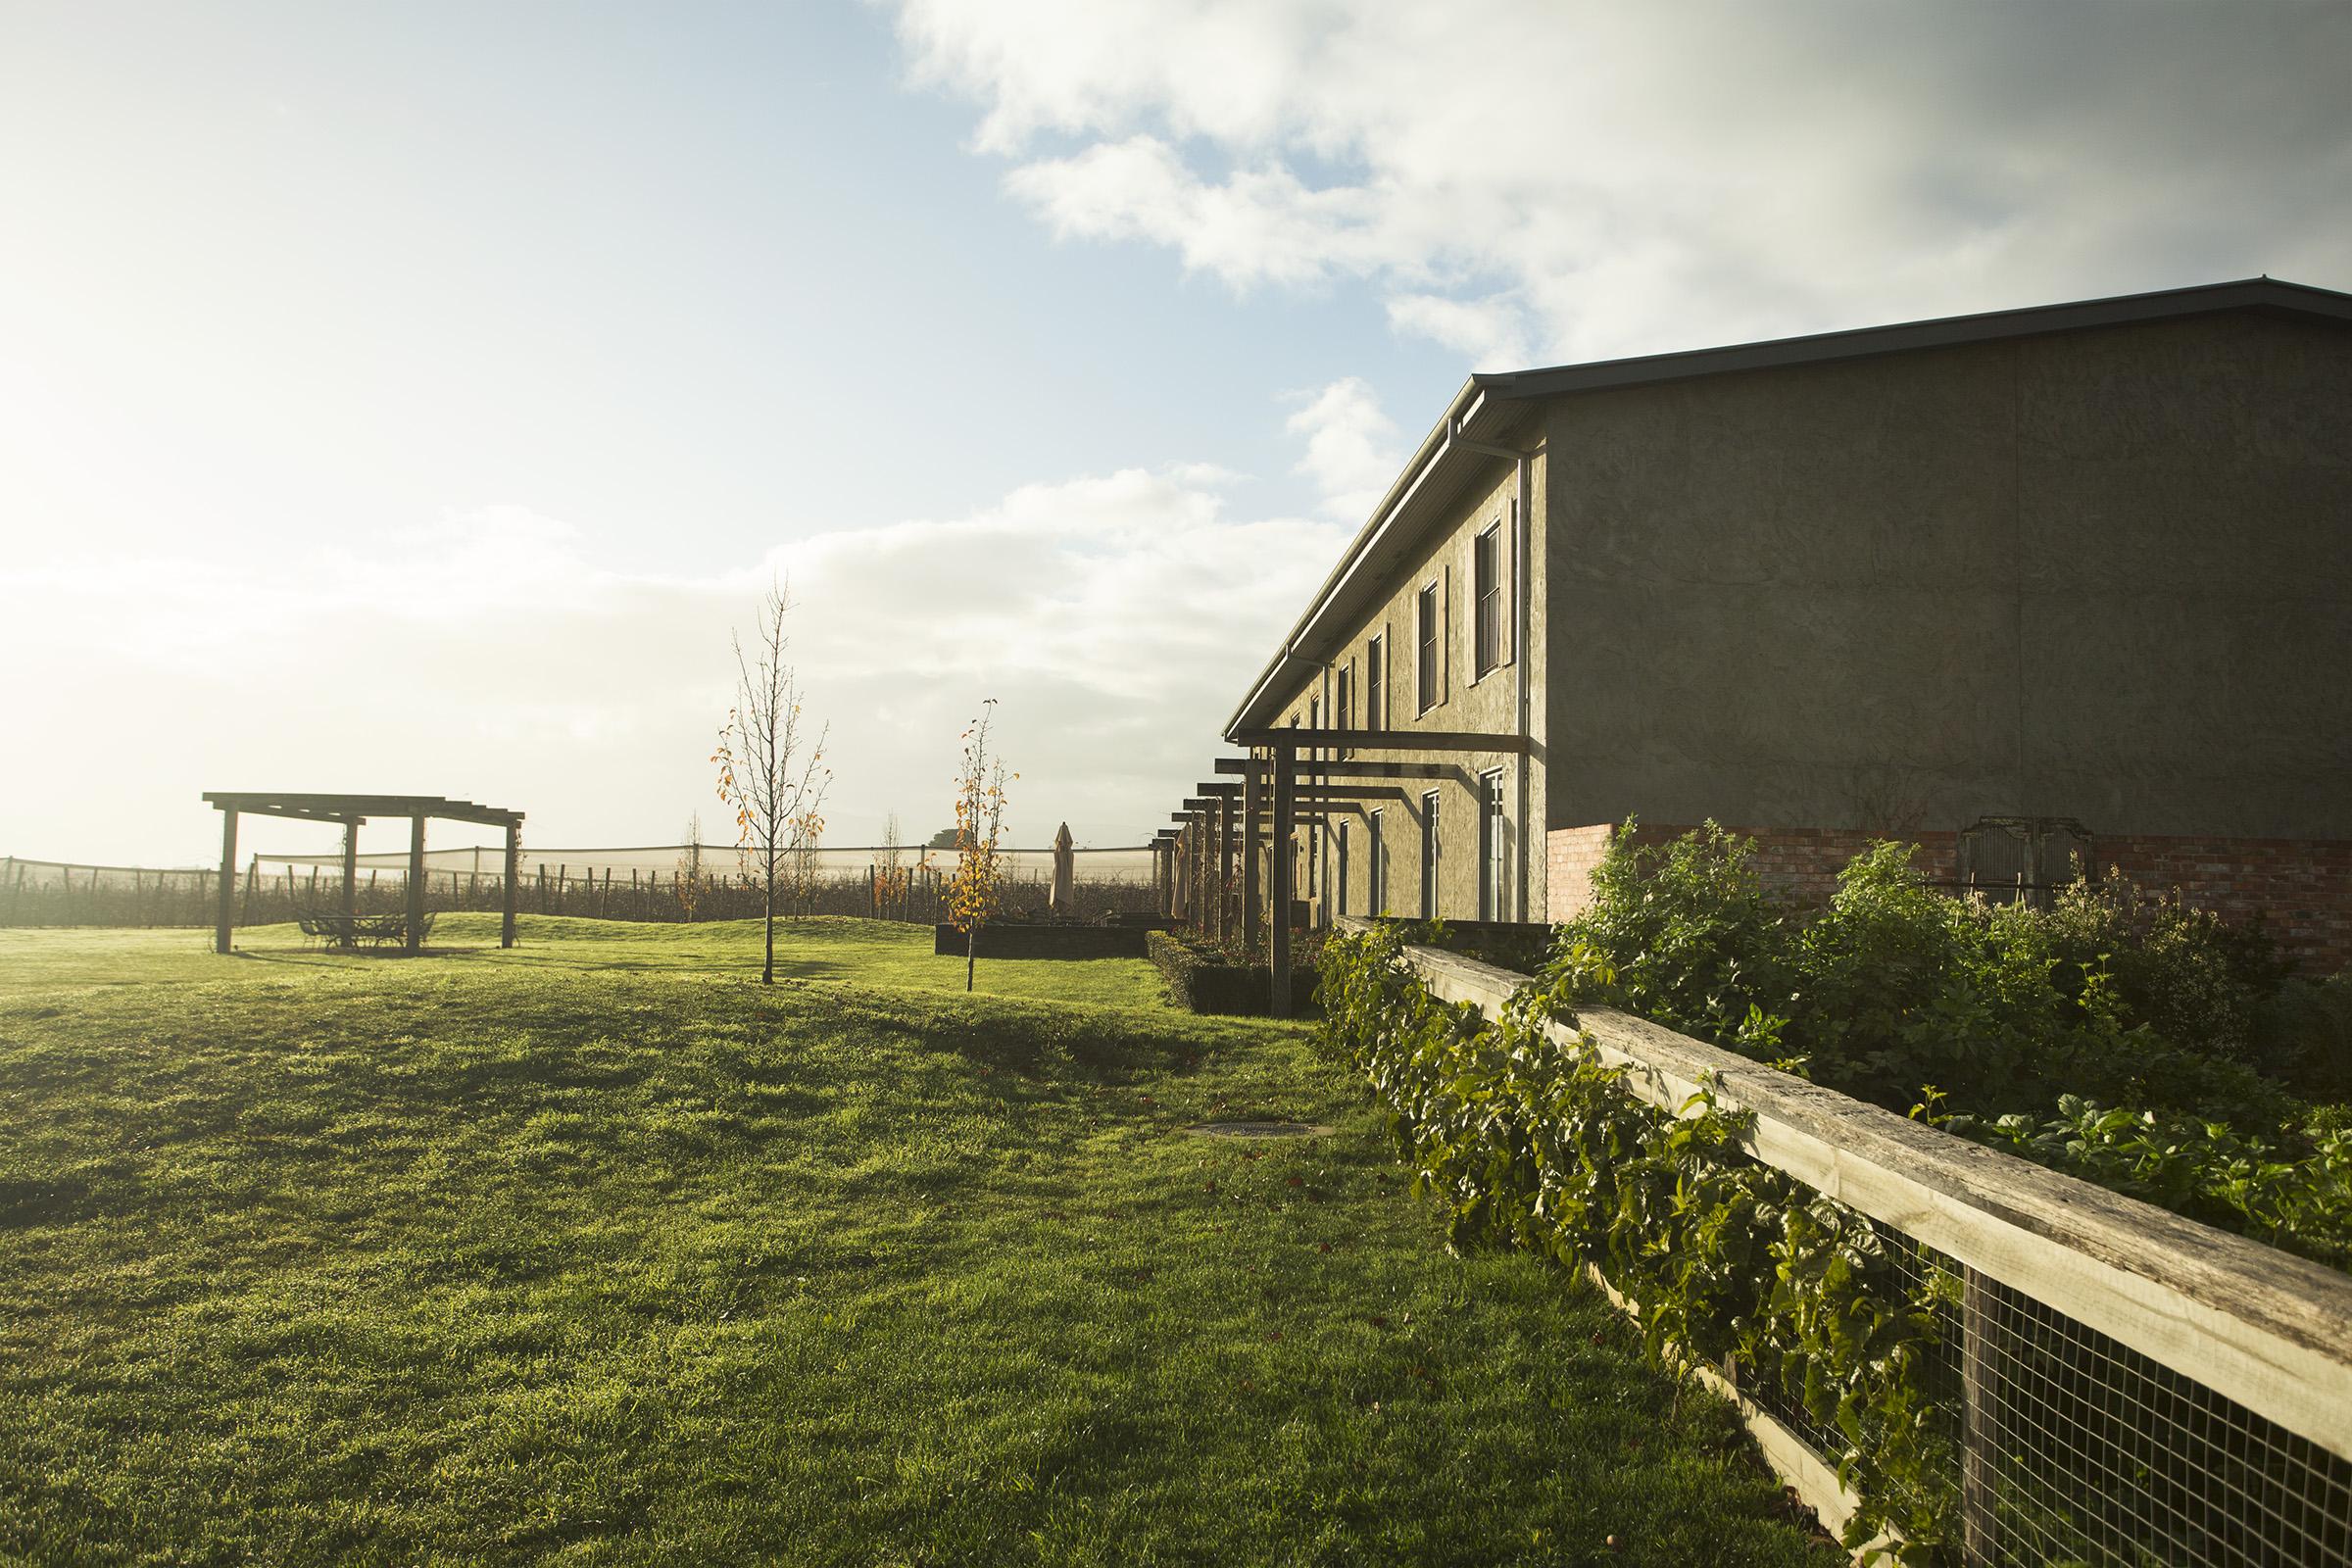 The Farmhouse at Meletos9.jpg